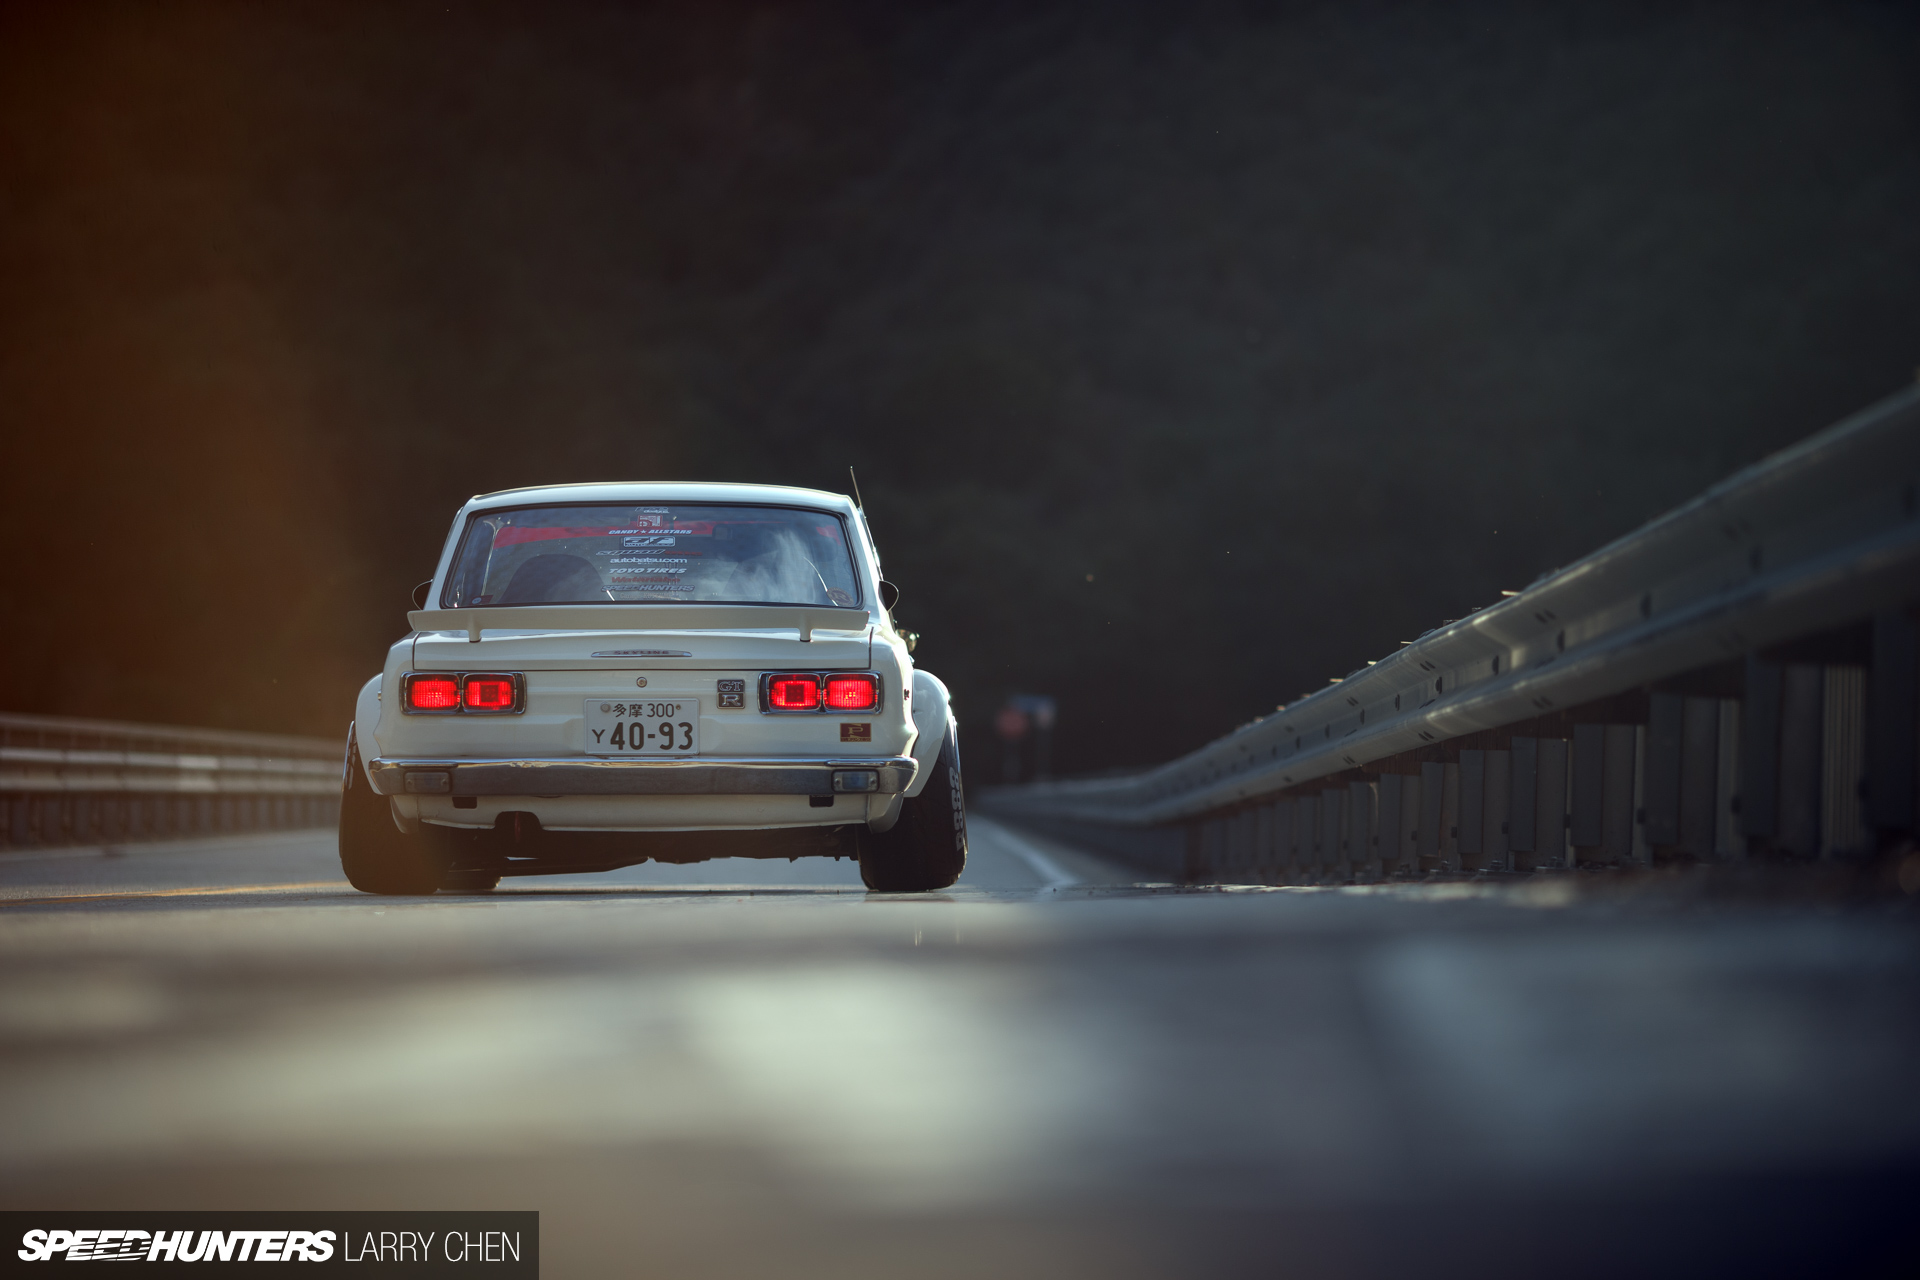 A Hakosuka In The Hills - Speedhunters